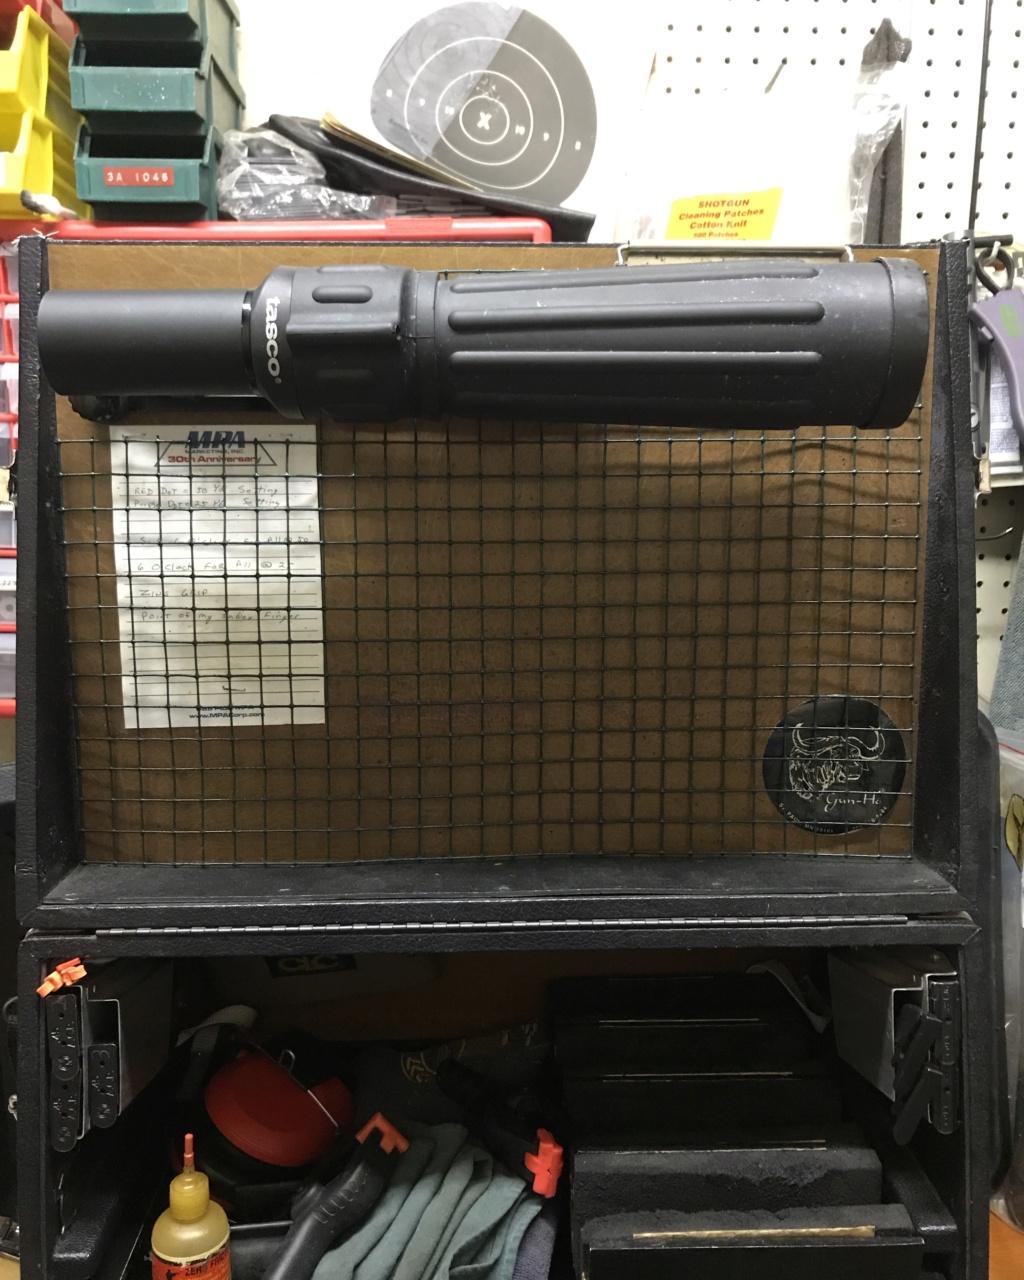 WTS - Tasco Spotting Scope - Lower Price Snapsh10